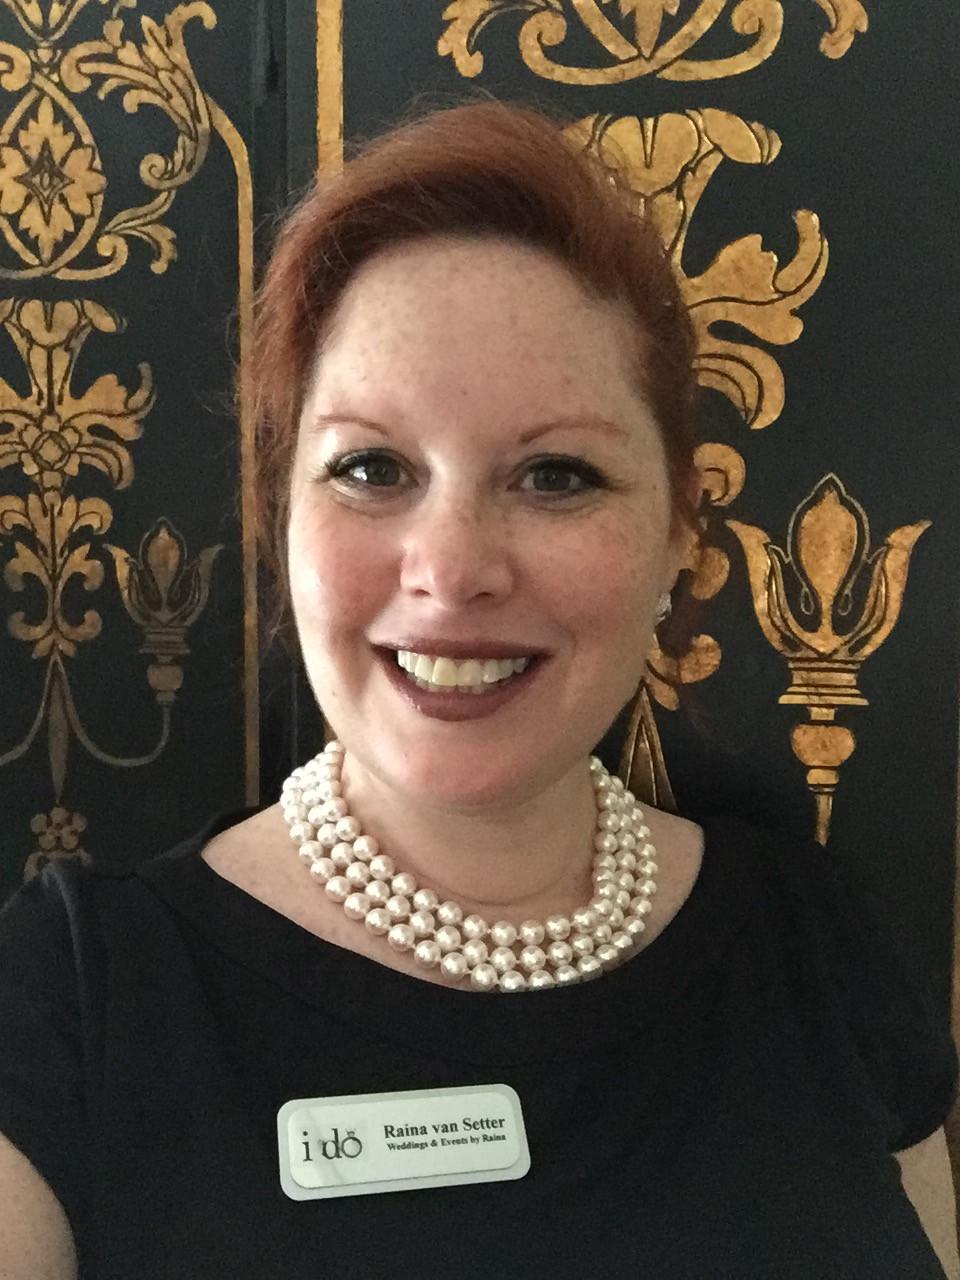 Nashville Wedding Planner - Weddings & Events by Raina